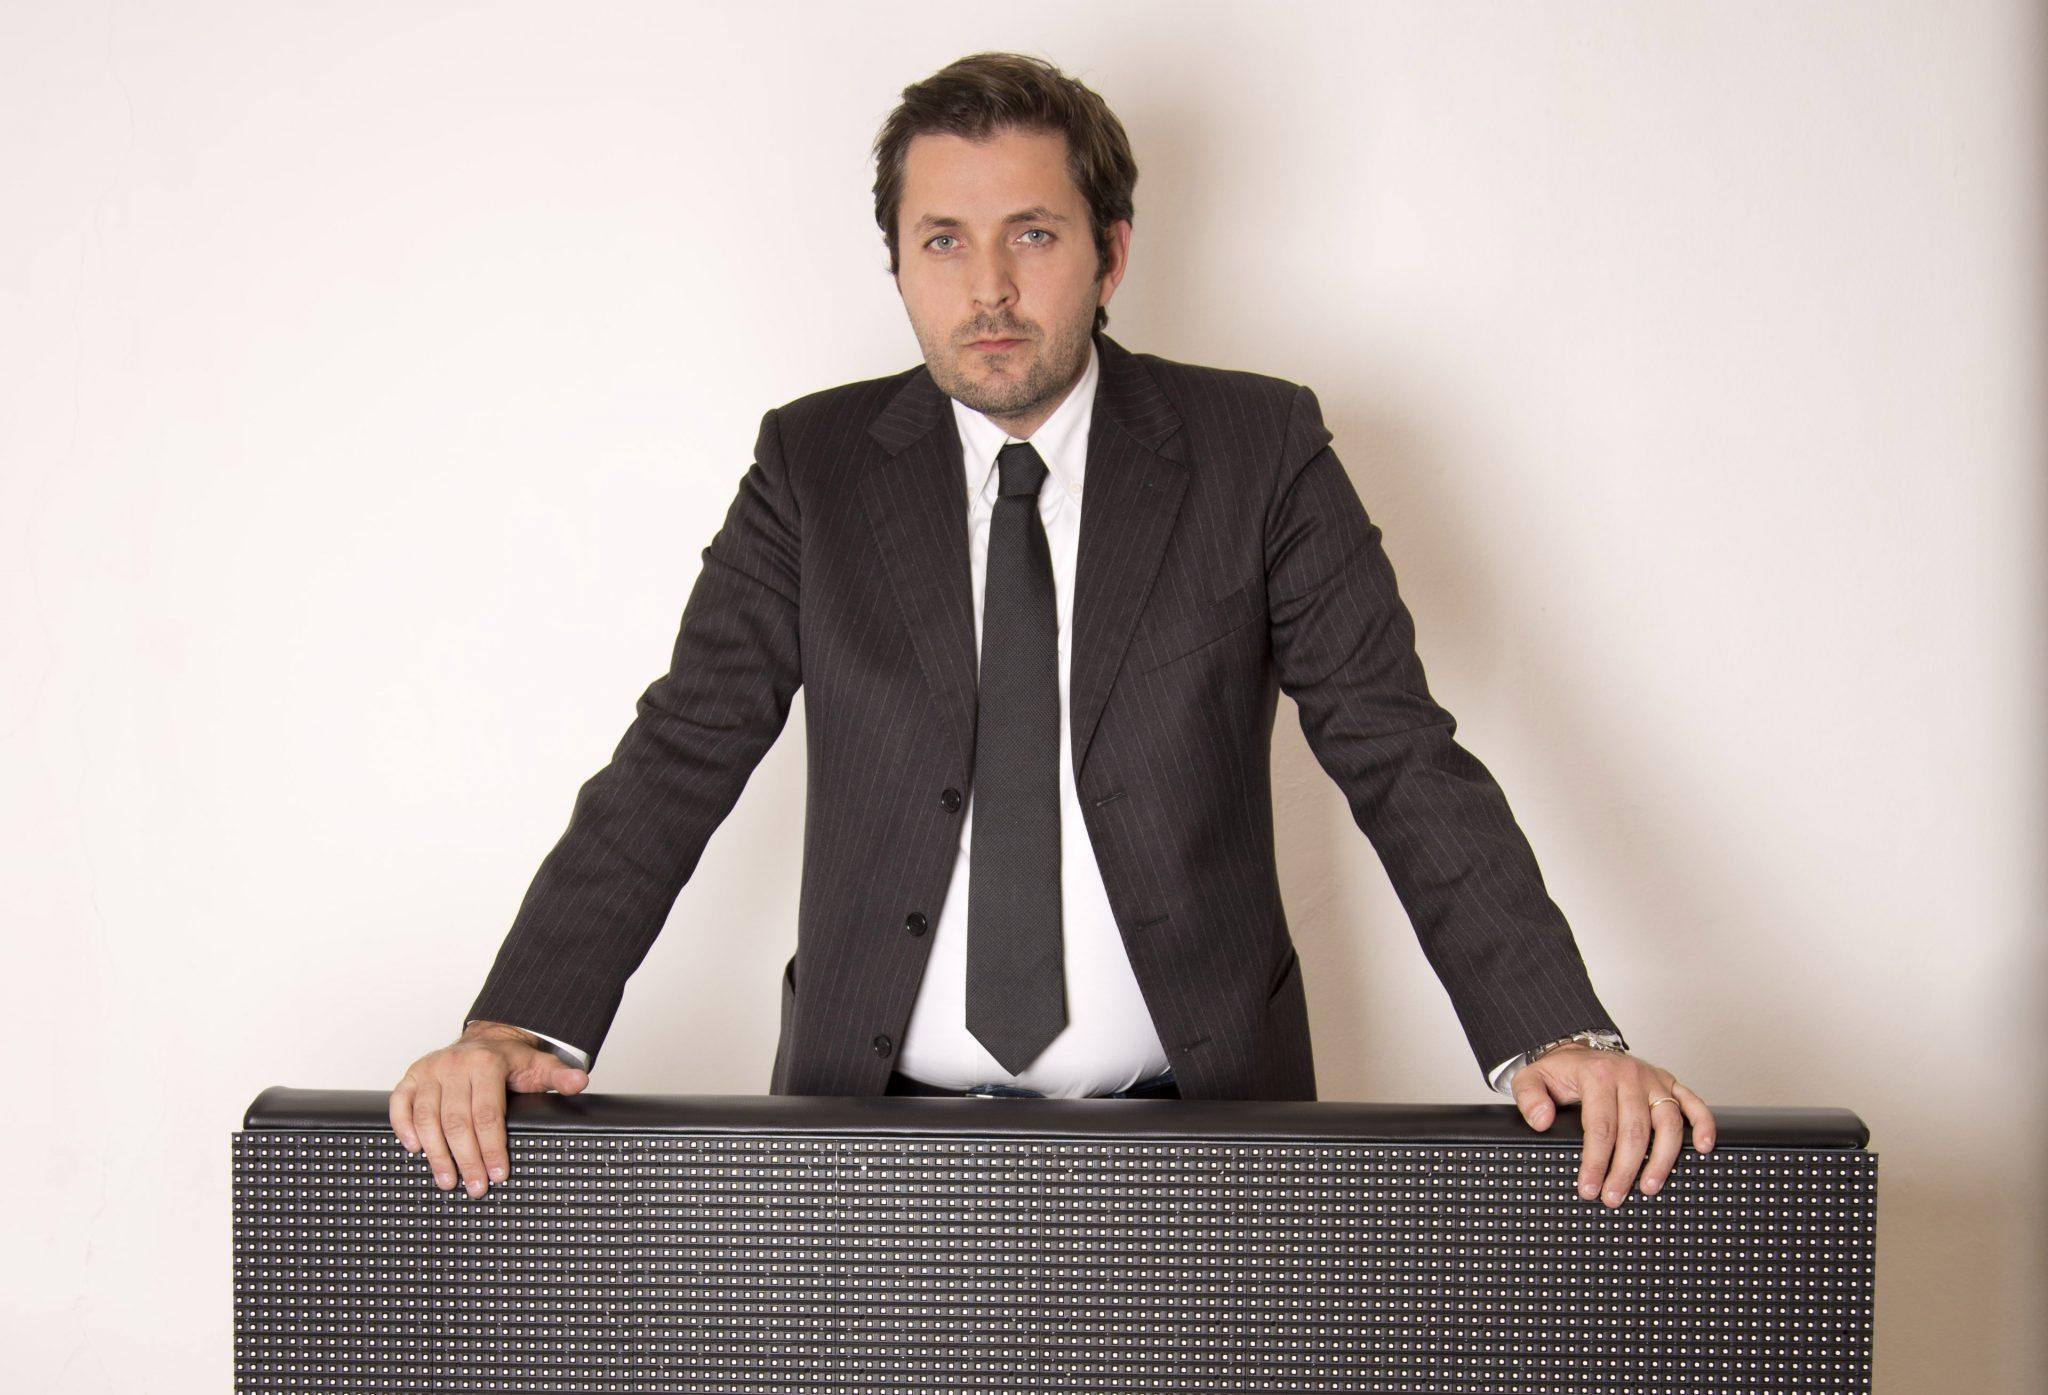 Alessio Abbateianni, owner The Mad Box